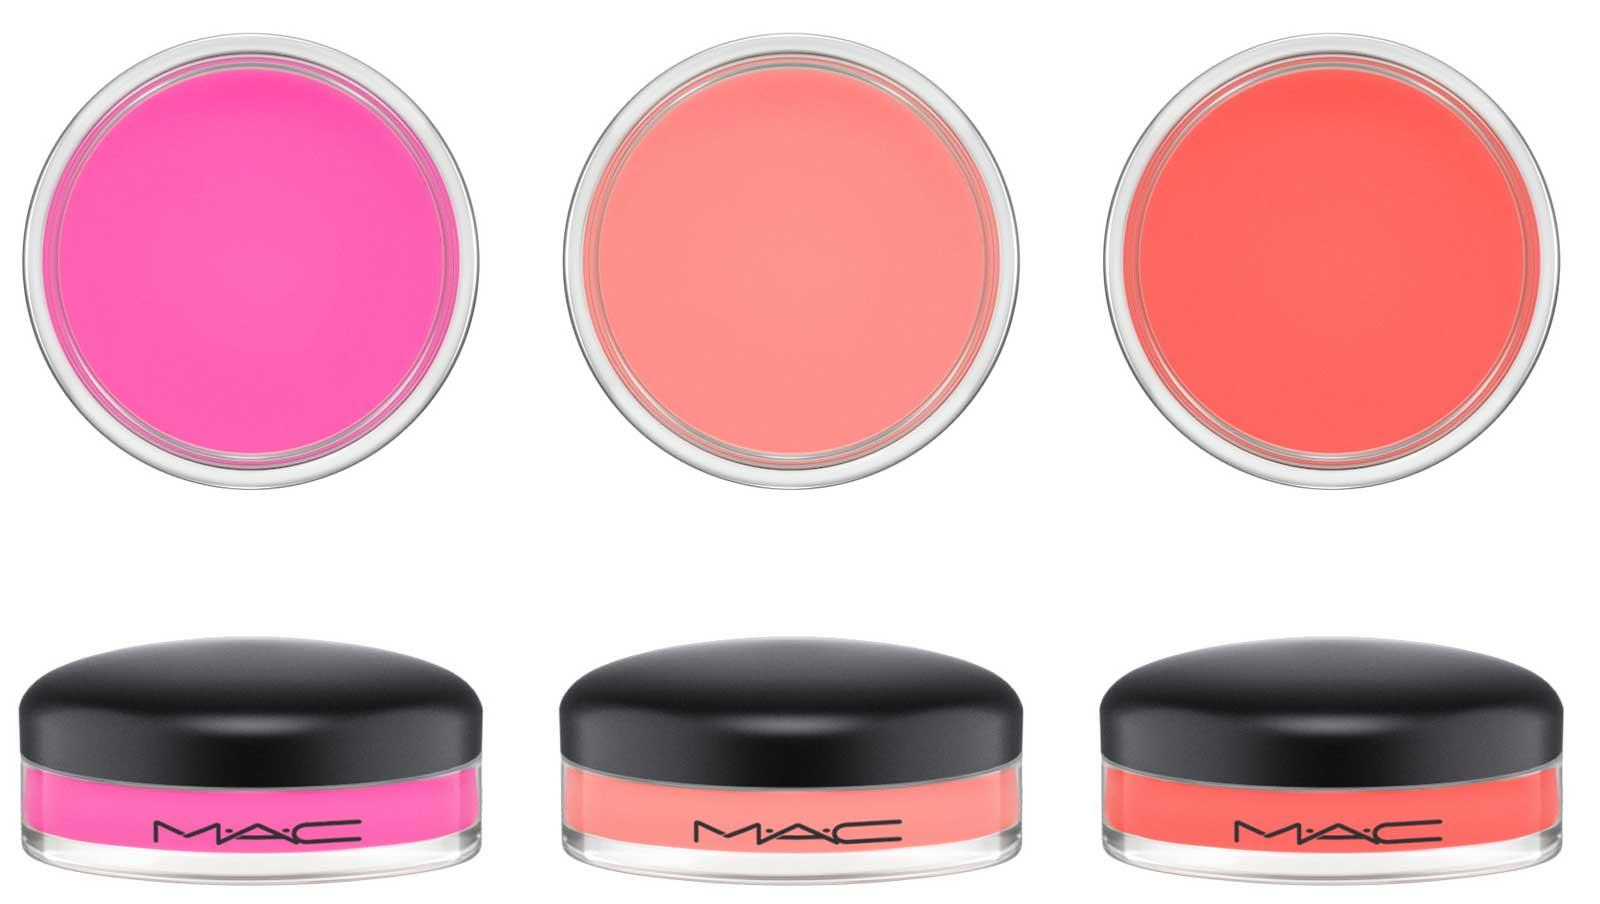 1-mac-crystal-glaze-gloss